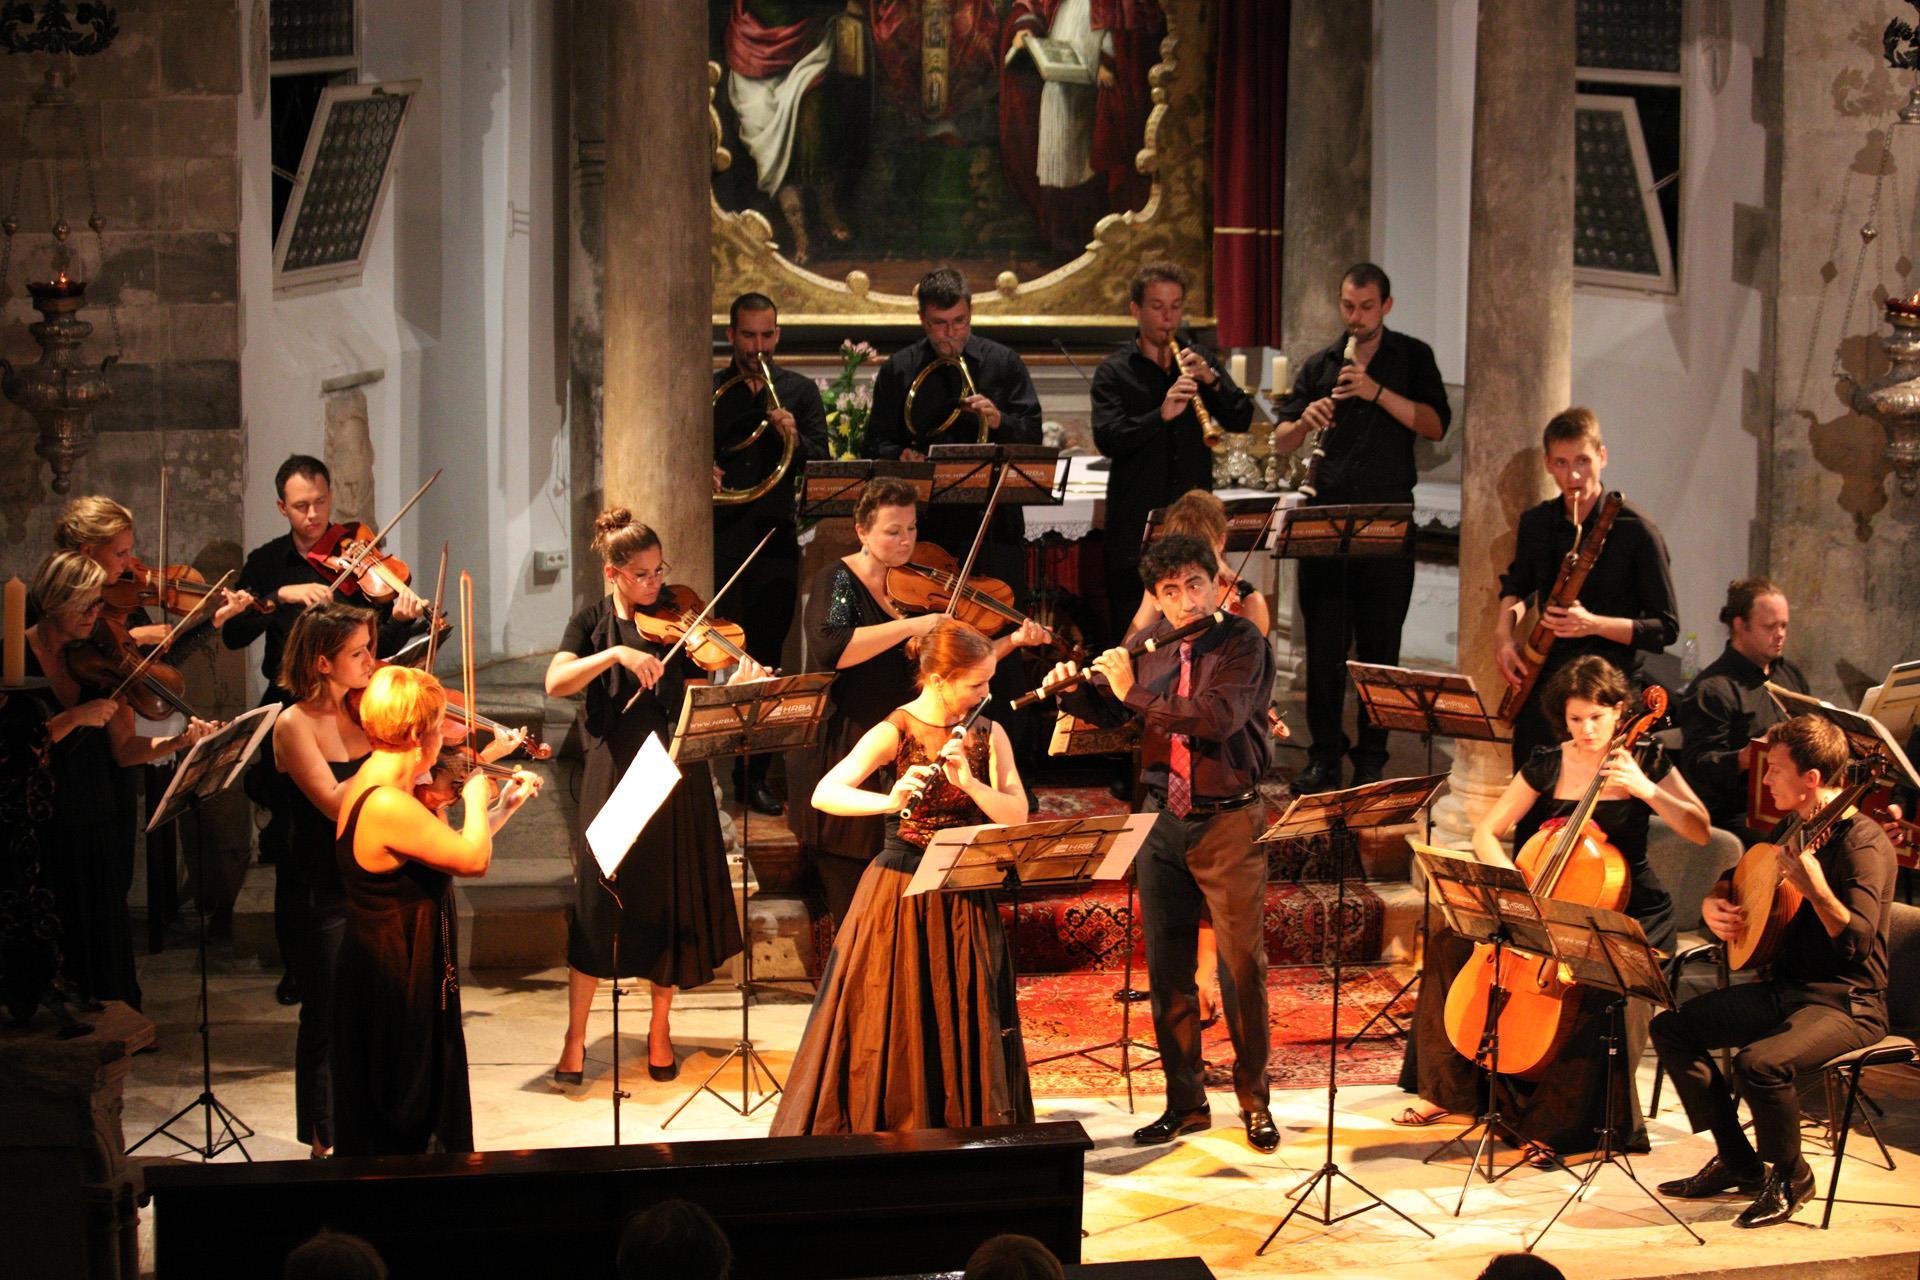 photos-courtesy-of-boris-berc-korkyra-baroque-festival-13